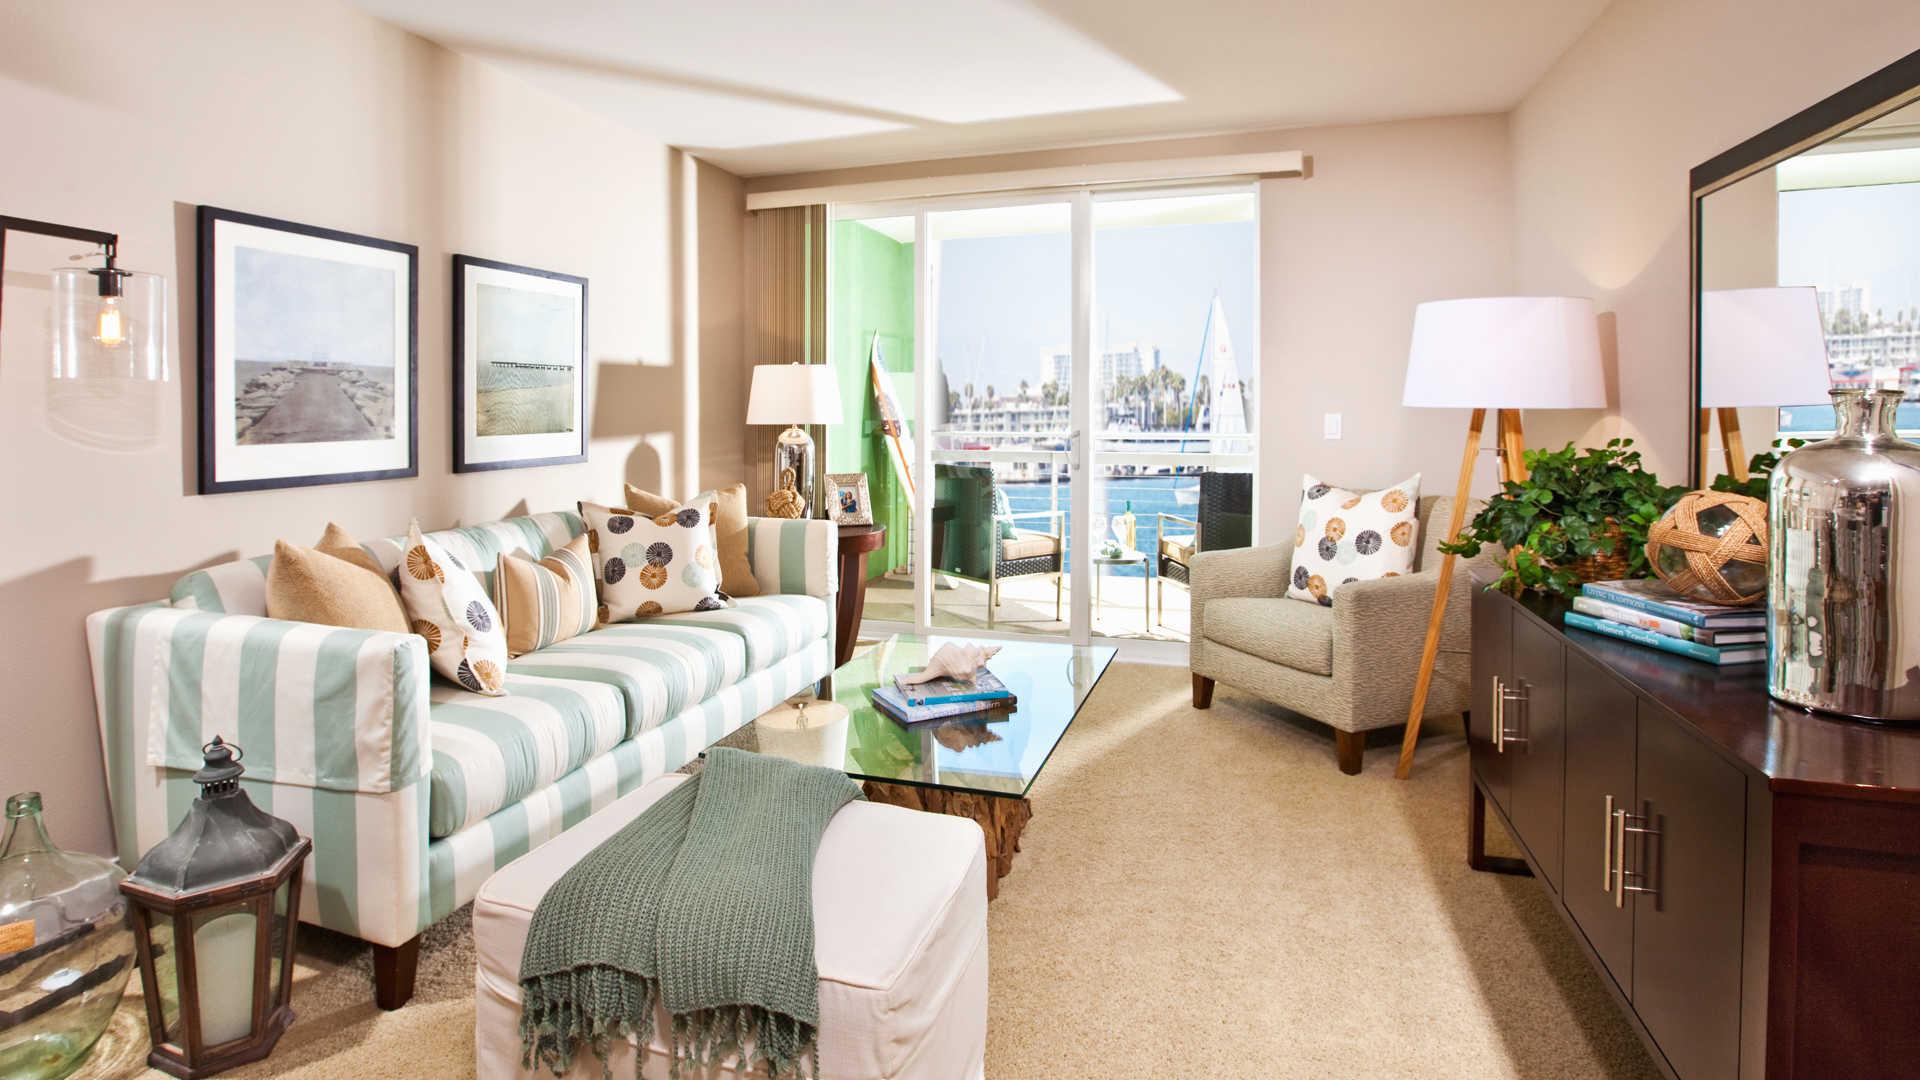 Breakwater At Marina Del Rey Apartments Reviews In Marina Del Rey   13900  Fiji Way | EquityApartments.com